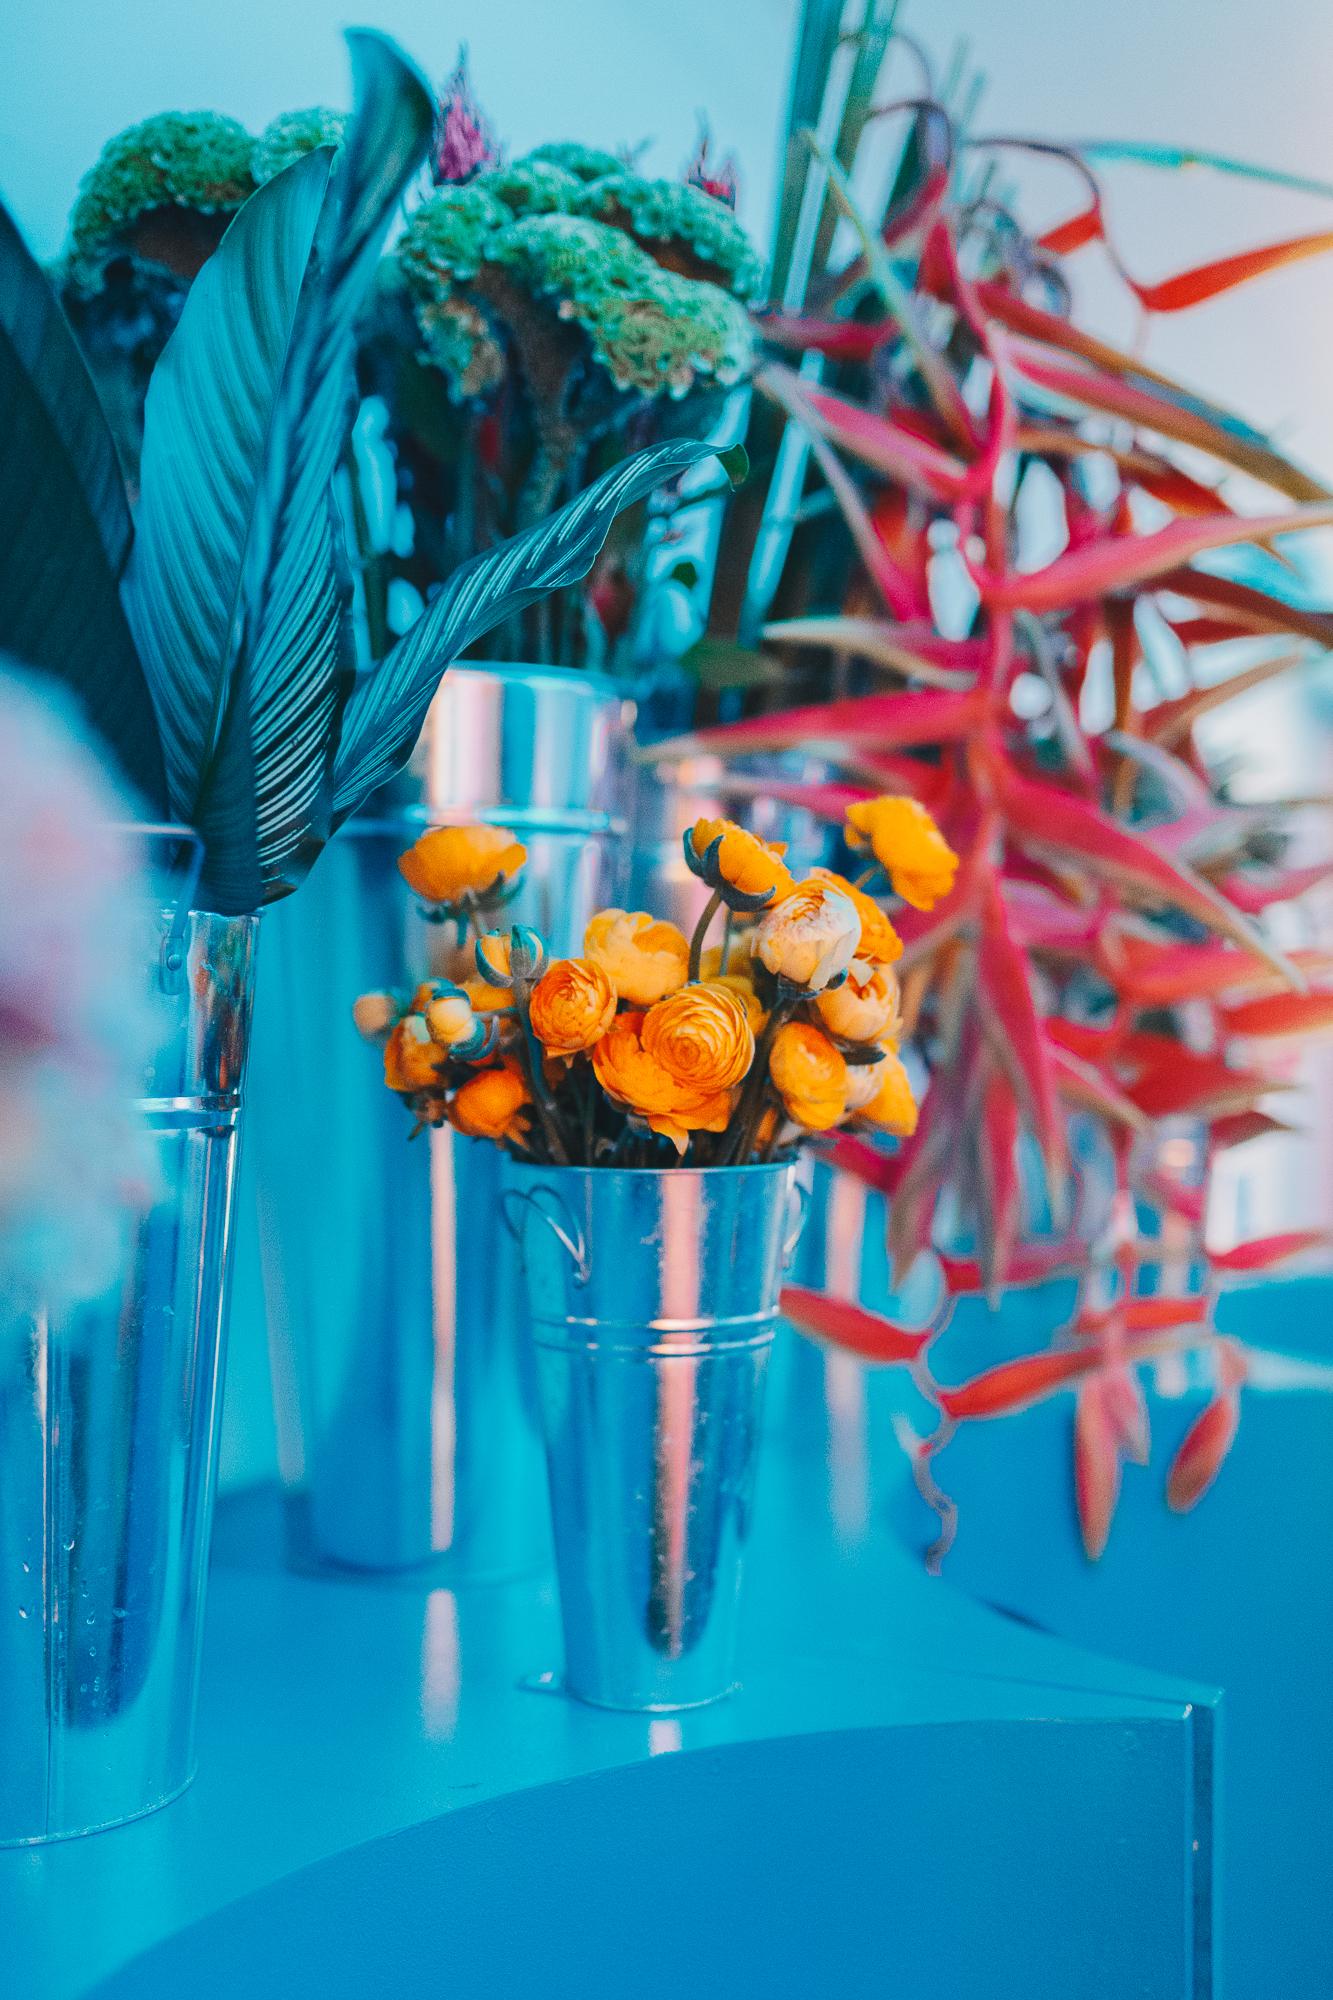 Stems Brooklyn flowers